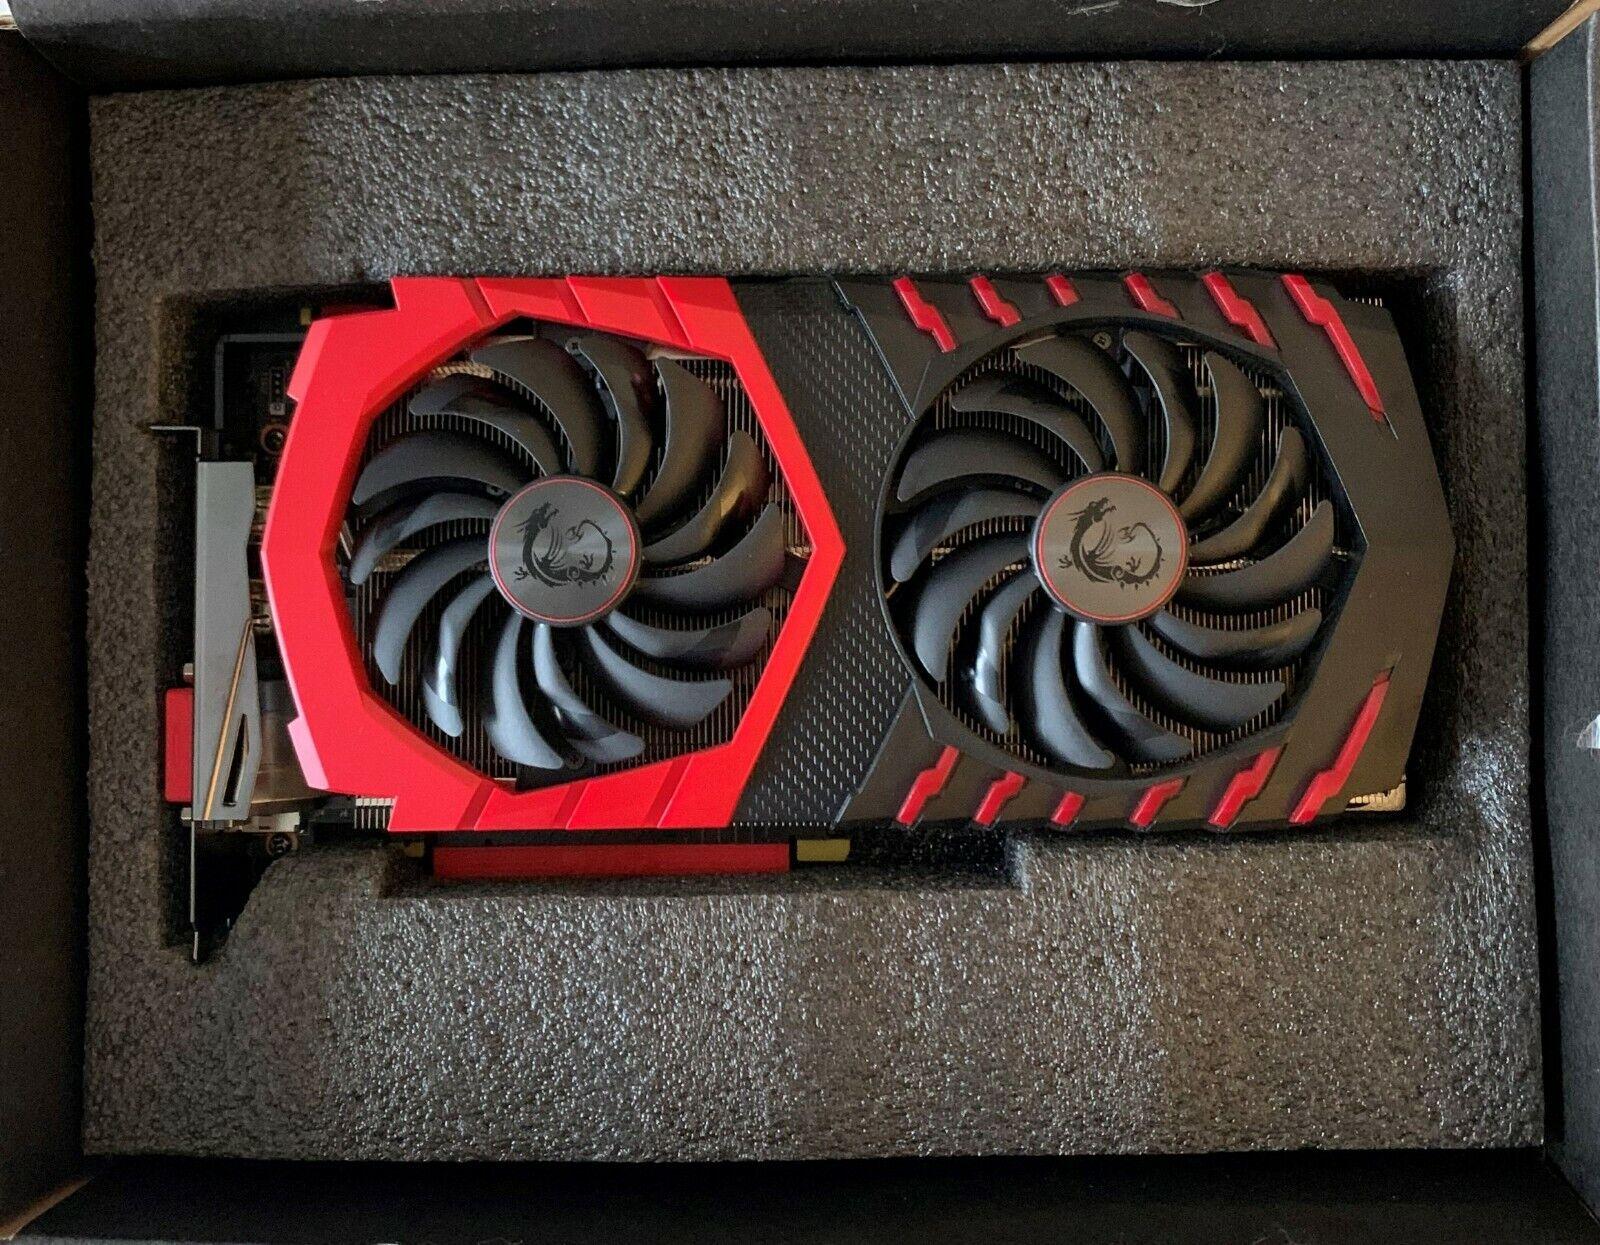 MSI NVIDIA GeForce GTX 1080 Ti 11GB GDDR5X Gaming Graphics Card